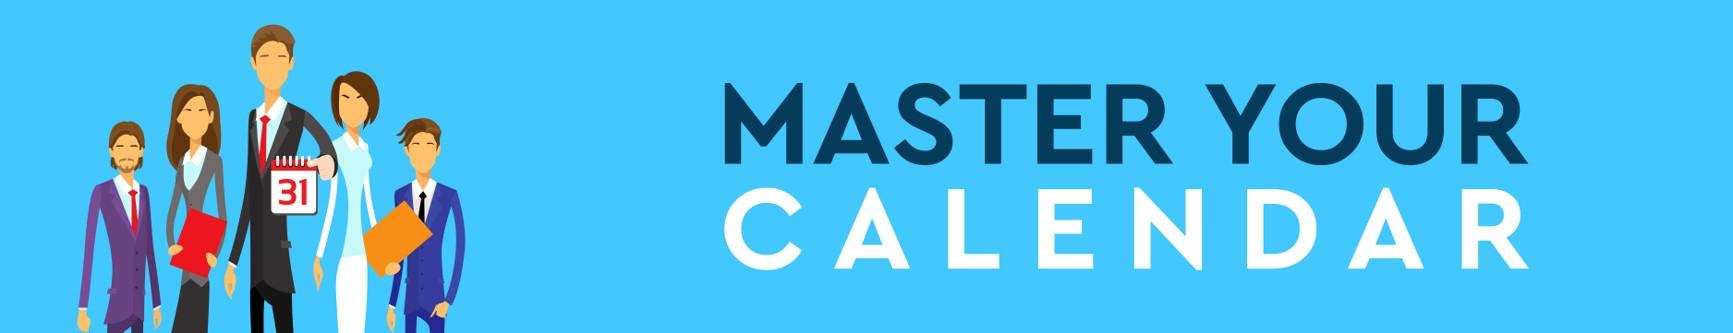 Master Your Calendar - banner